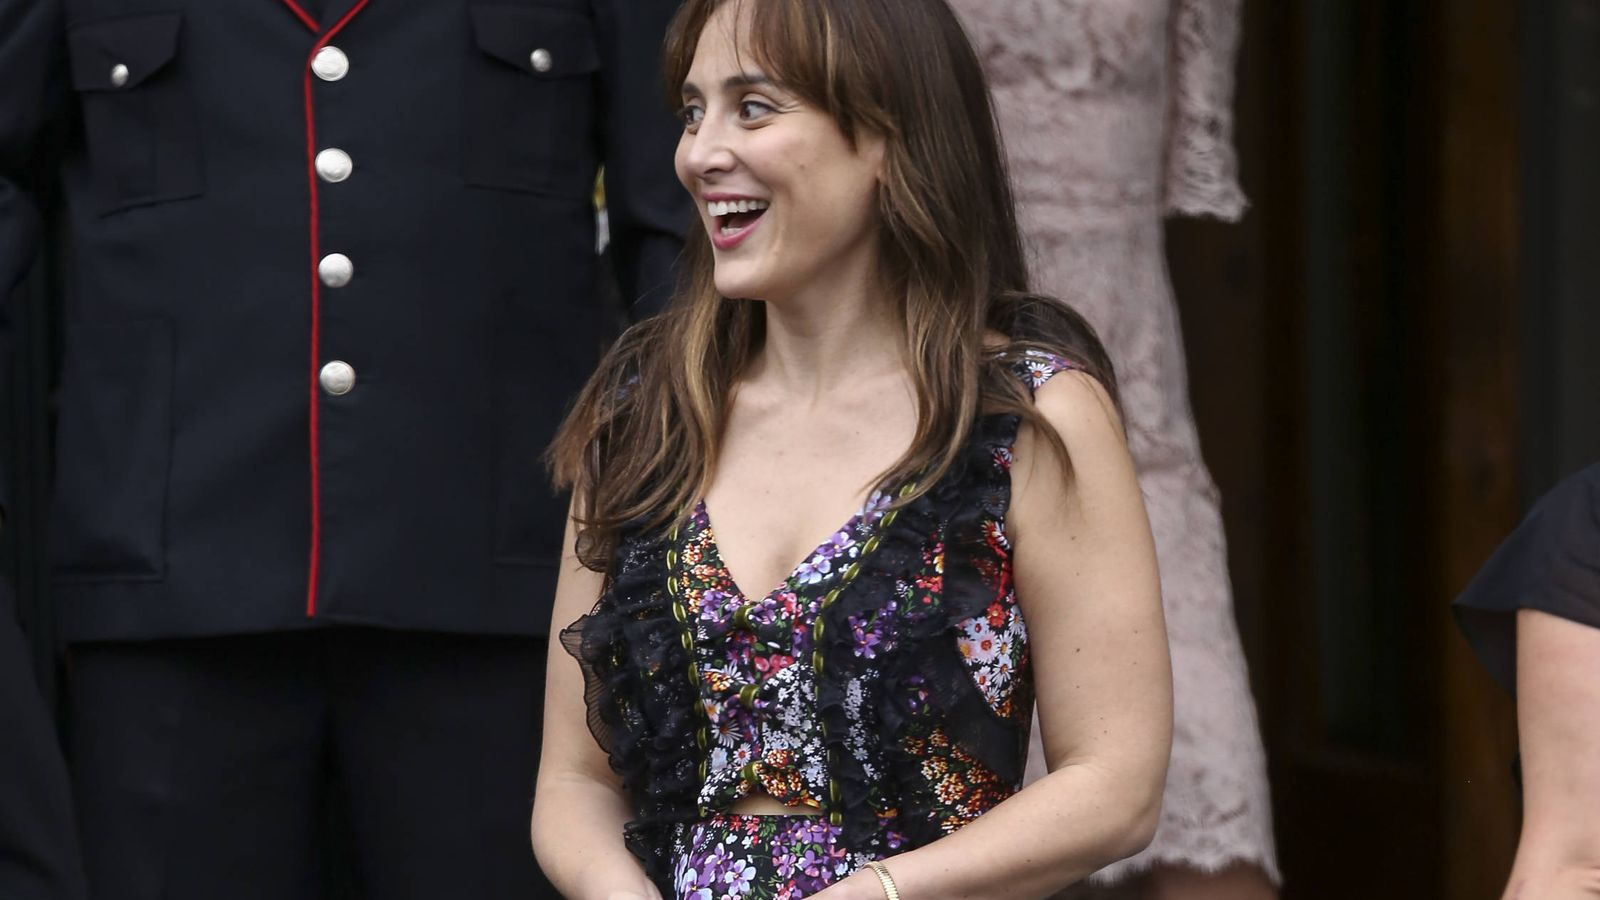 Foto: Tamara Falcó en la boda de Sassa de Osma con vestido diseñado por ella misma.